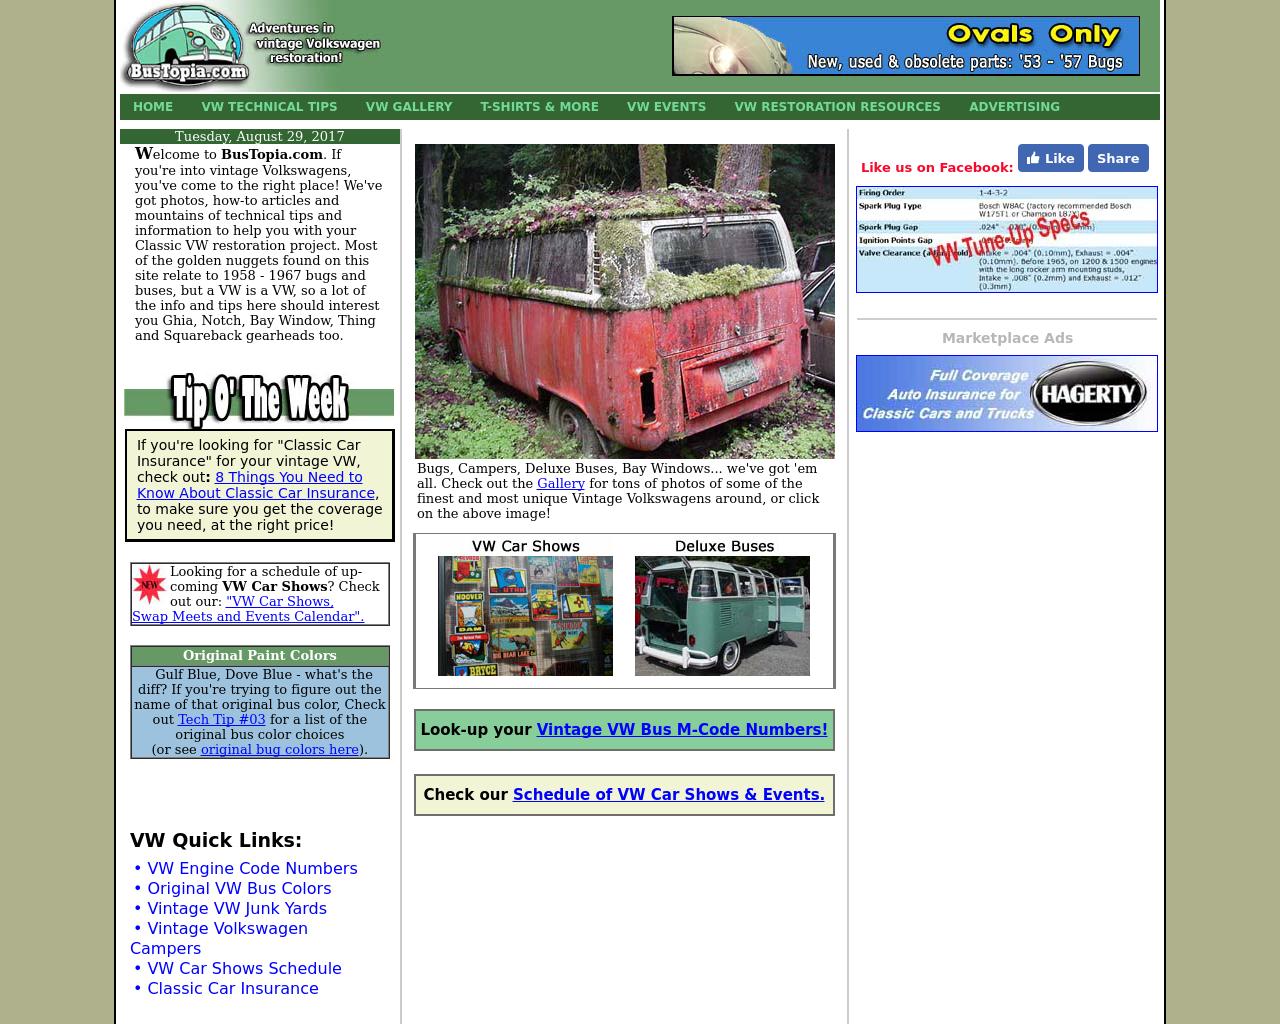 Bustopia-Advertising-Reviews-Pricing